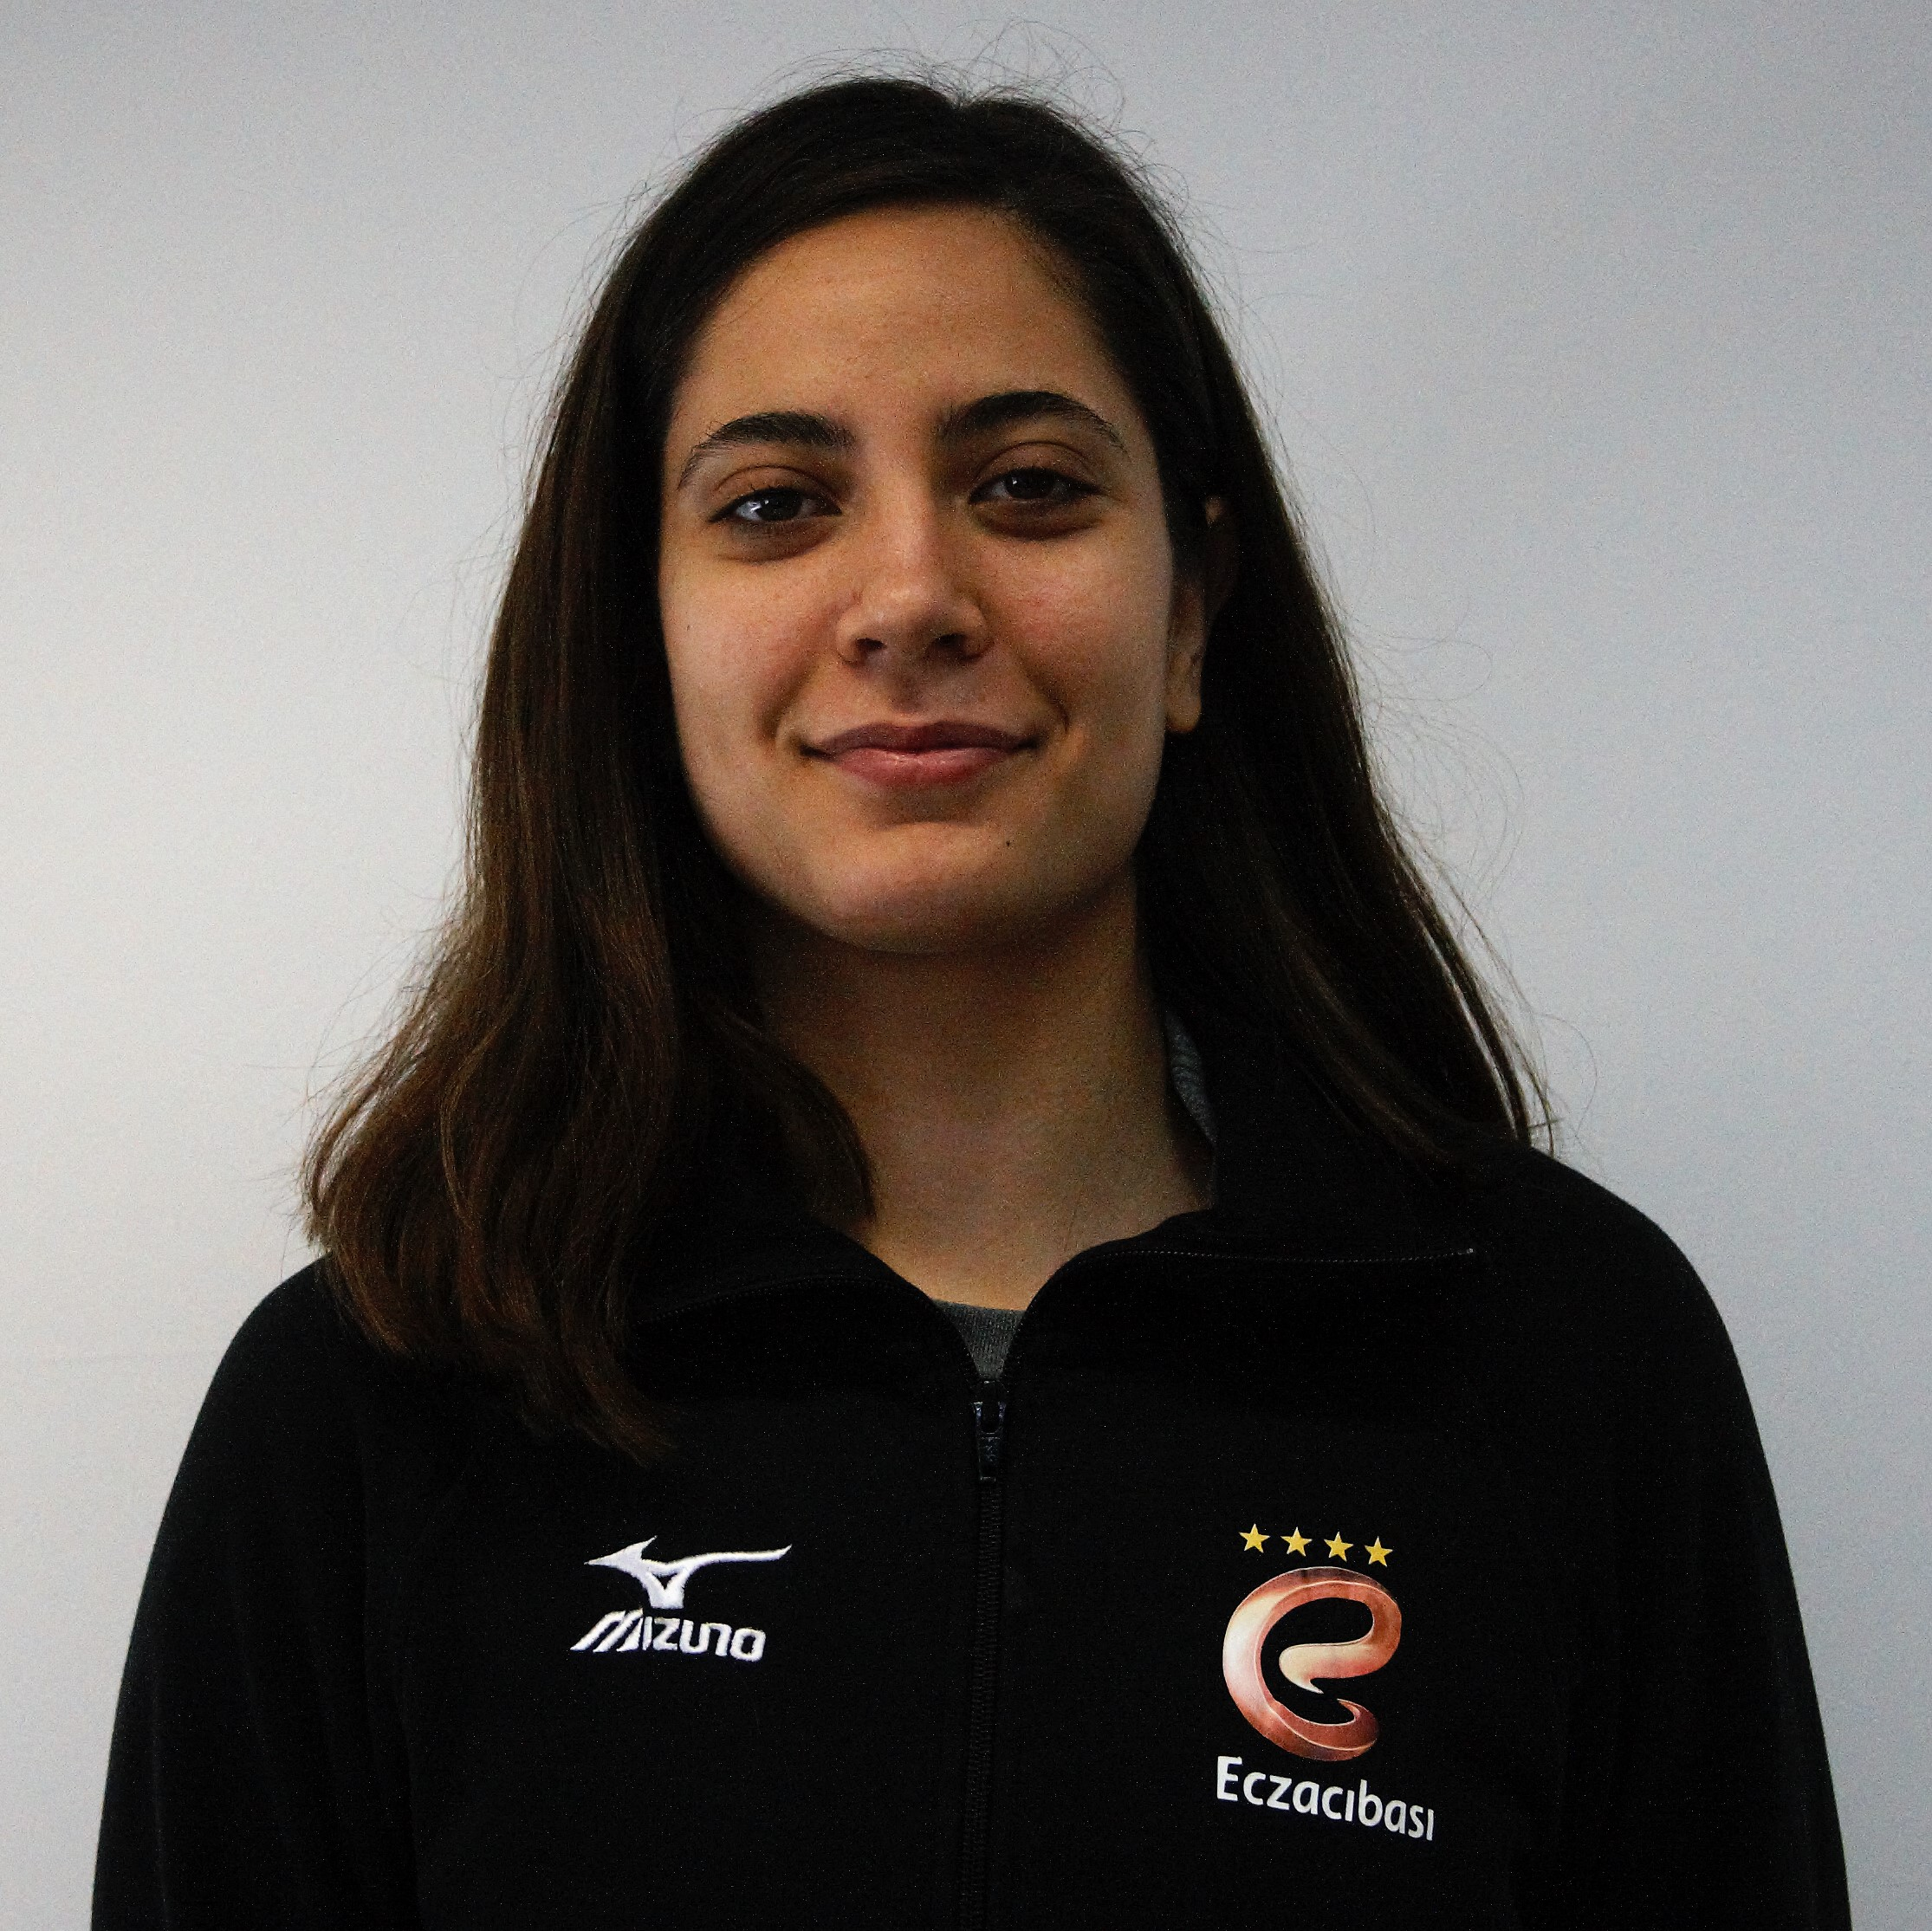 Aybuke Ozdemir